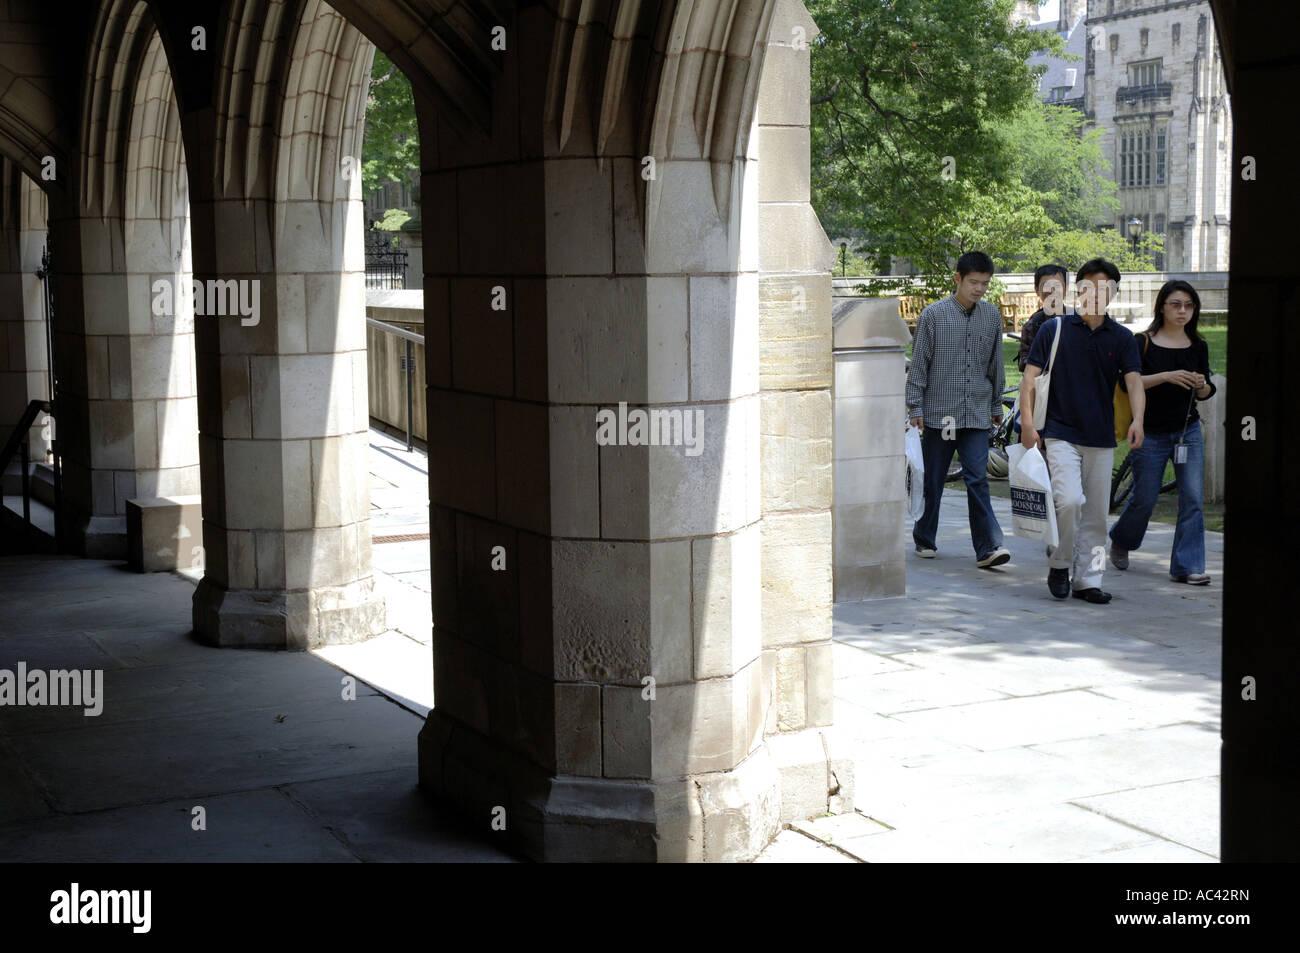 Berkeley Architecture Imágenes De Stock & Berkeley Architecture ...